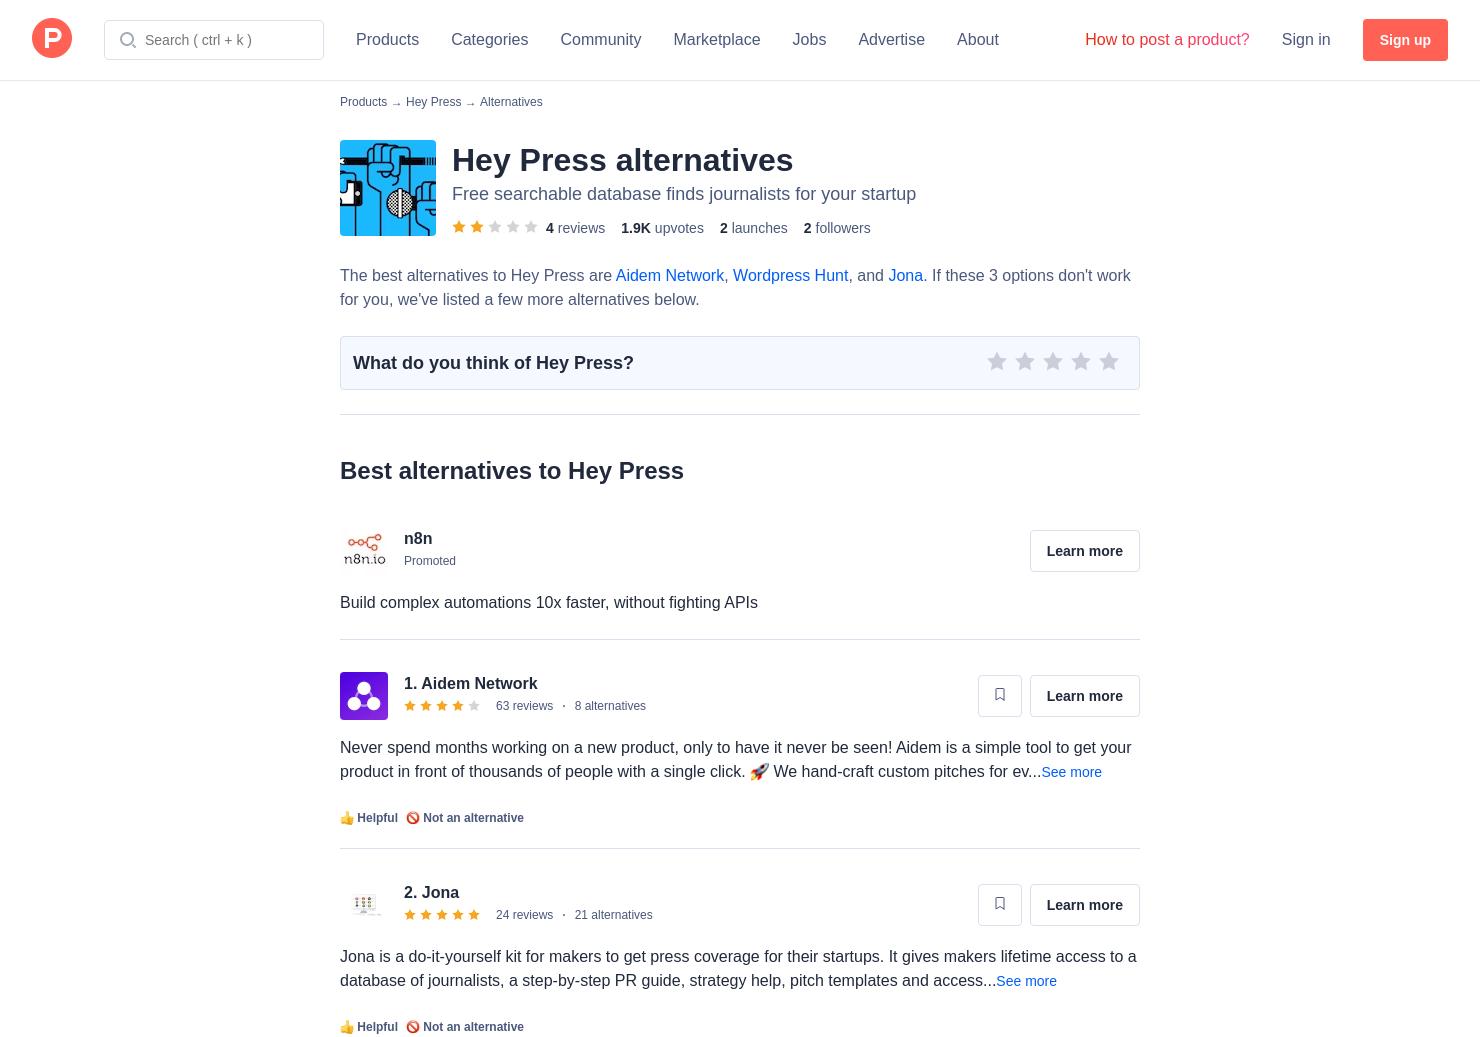 14 Alternatives to Hey Press | Product Hunt